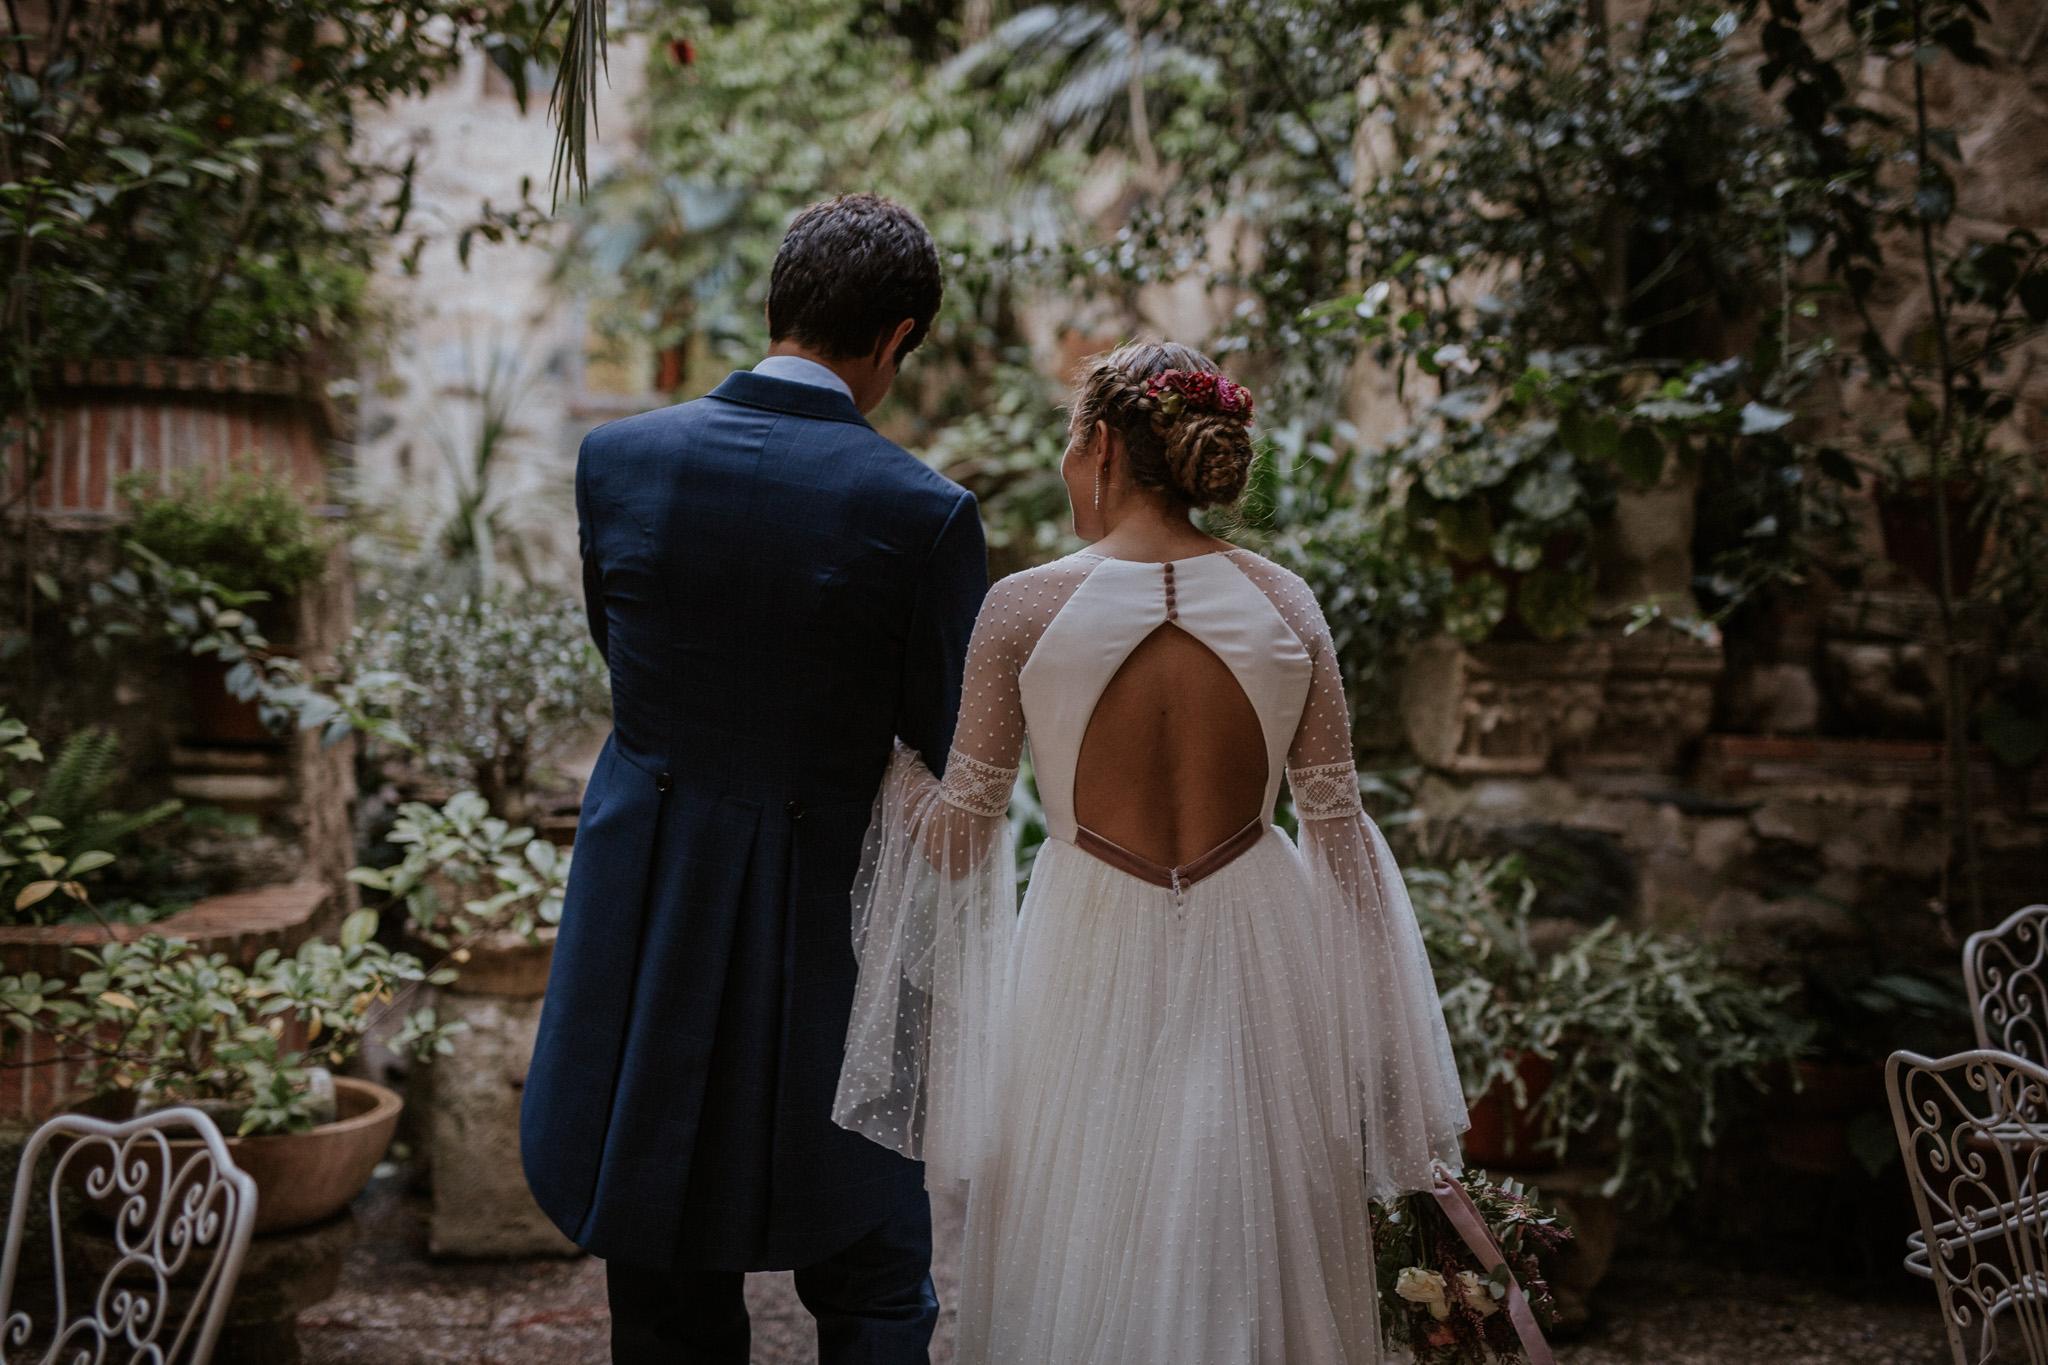 fotografia-boda-wedding-photographer-spain-concorazon-221